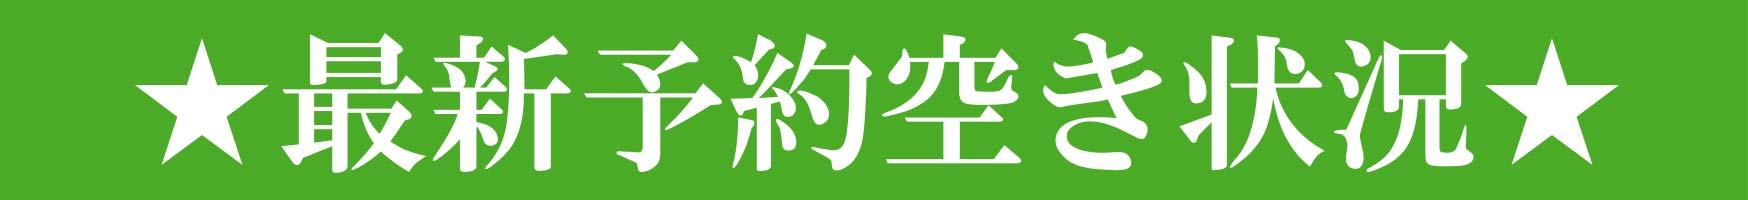 yoyaku-aki.jpg